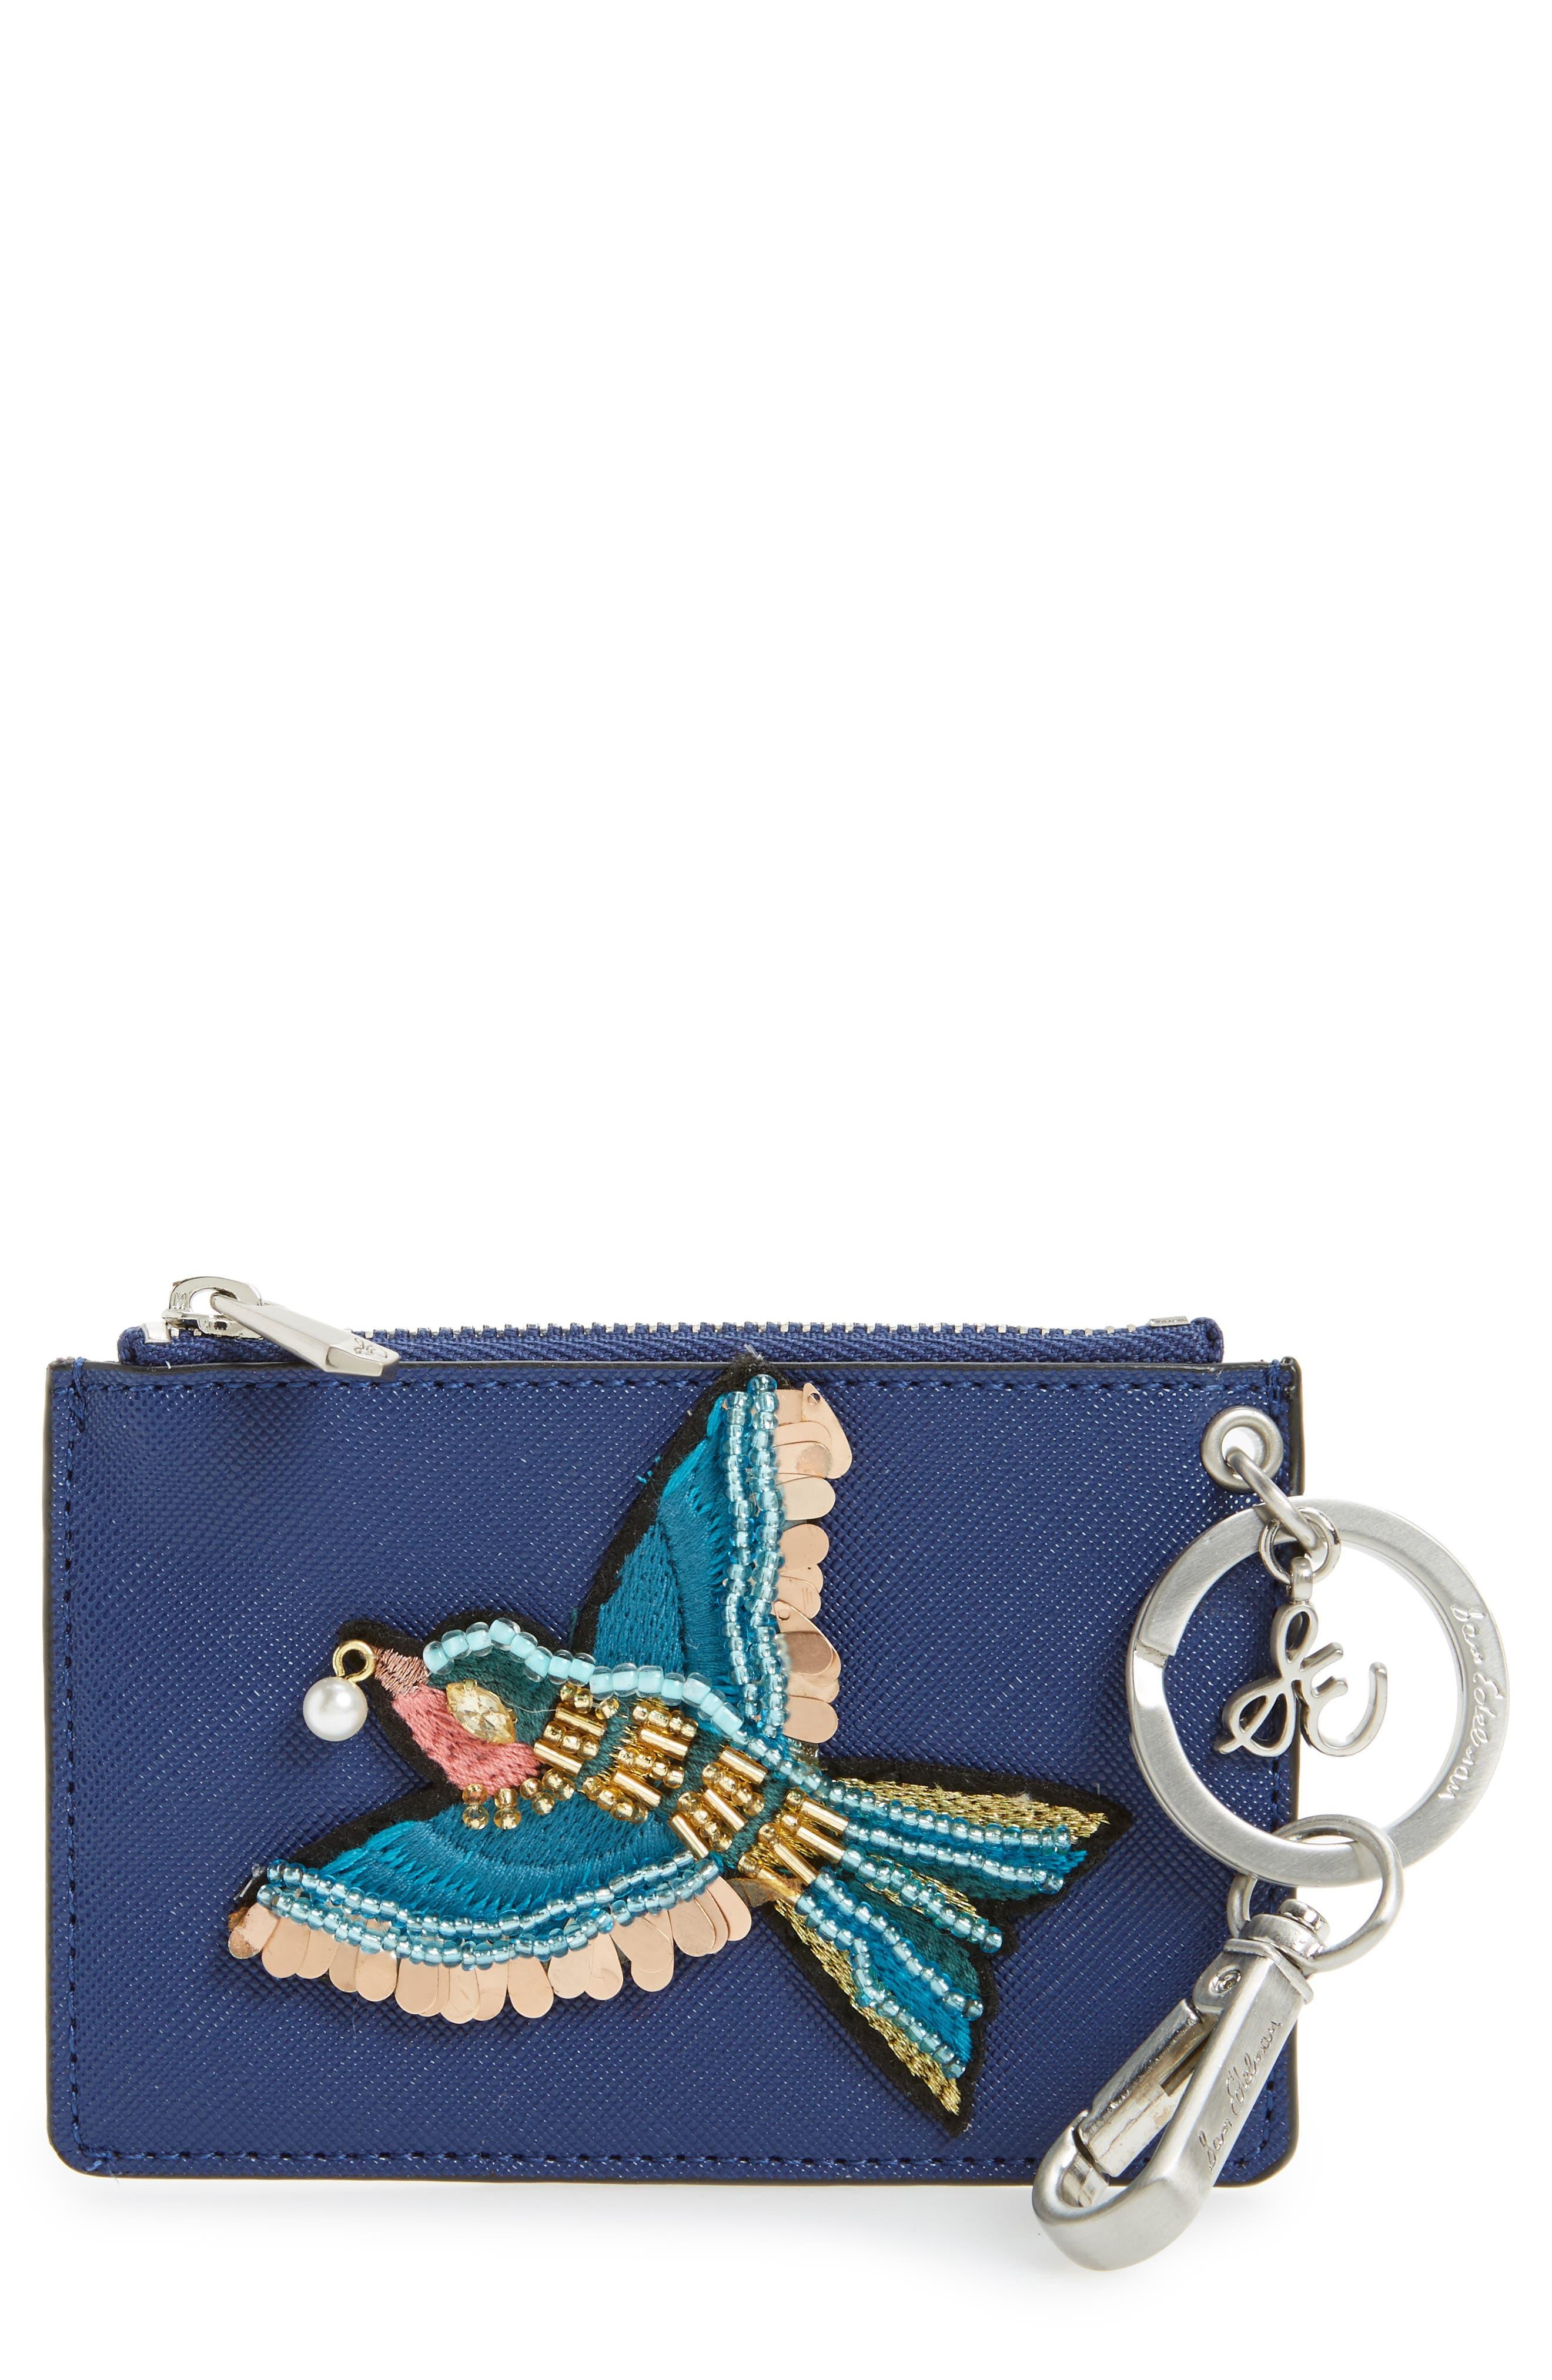 Carter Bird Embellished Faux Leather Card Case,                         Main,                         color, Poseidon Blue